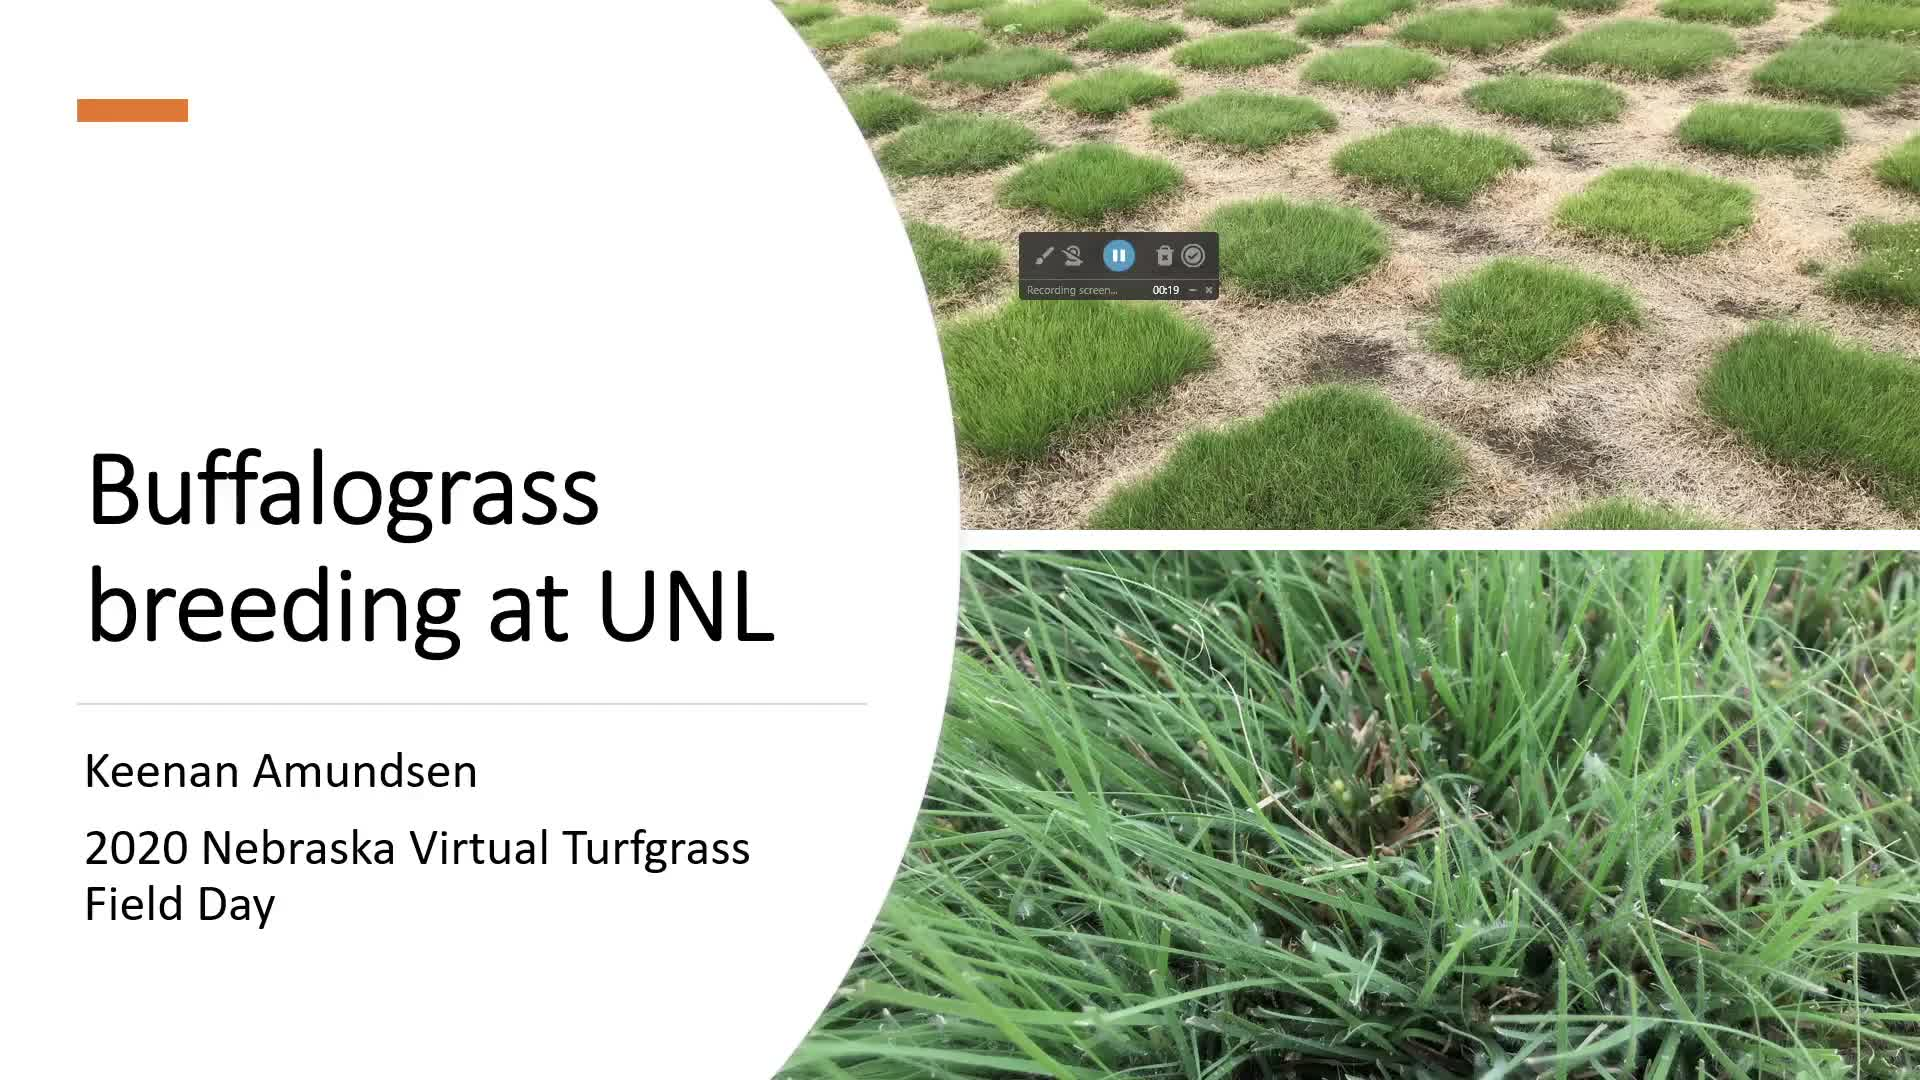 Buffalograss and Turfgrass Breeding Project